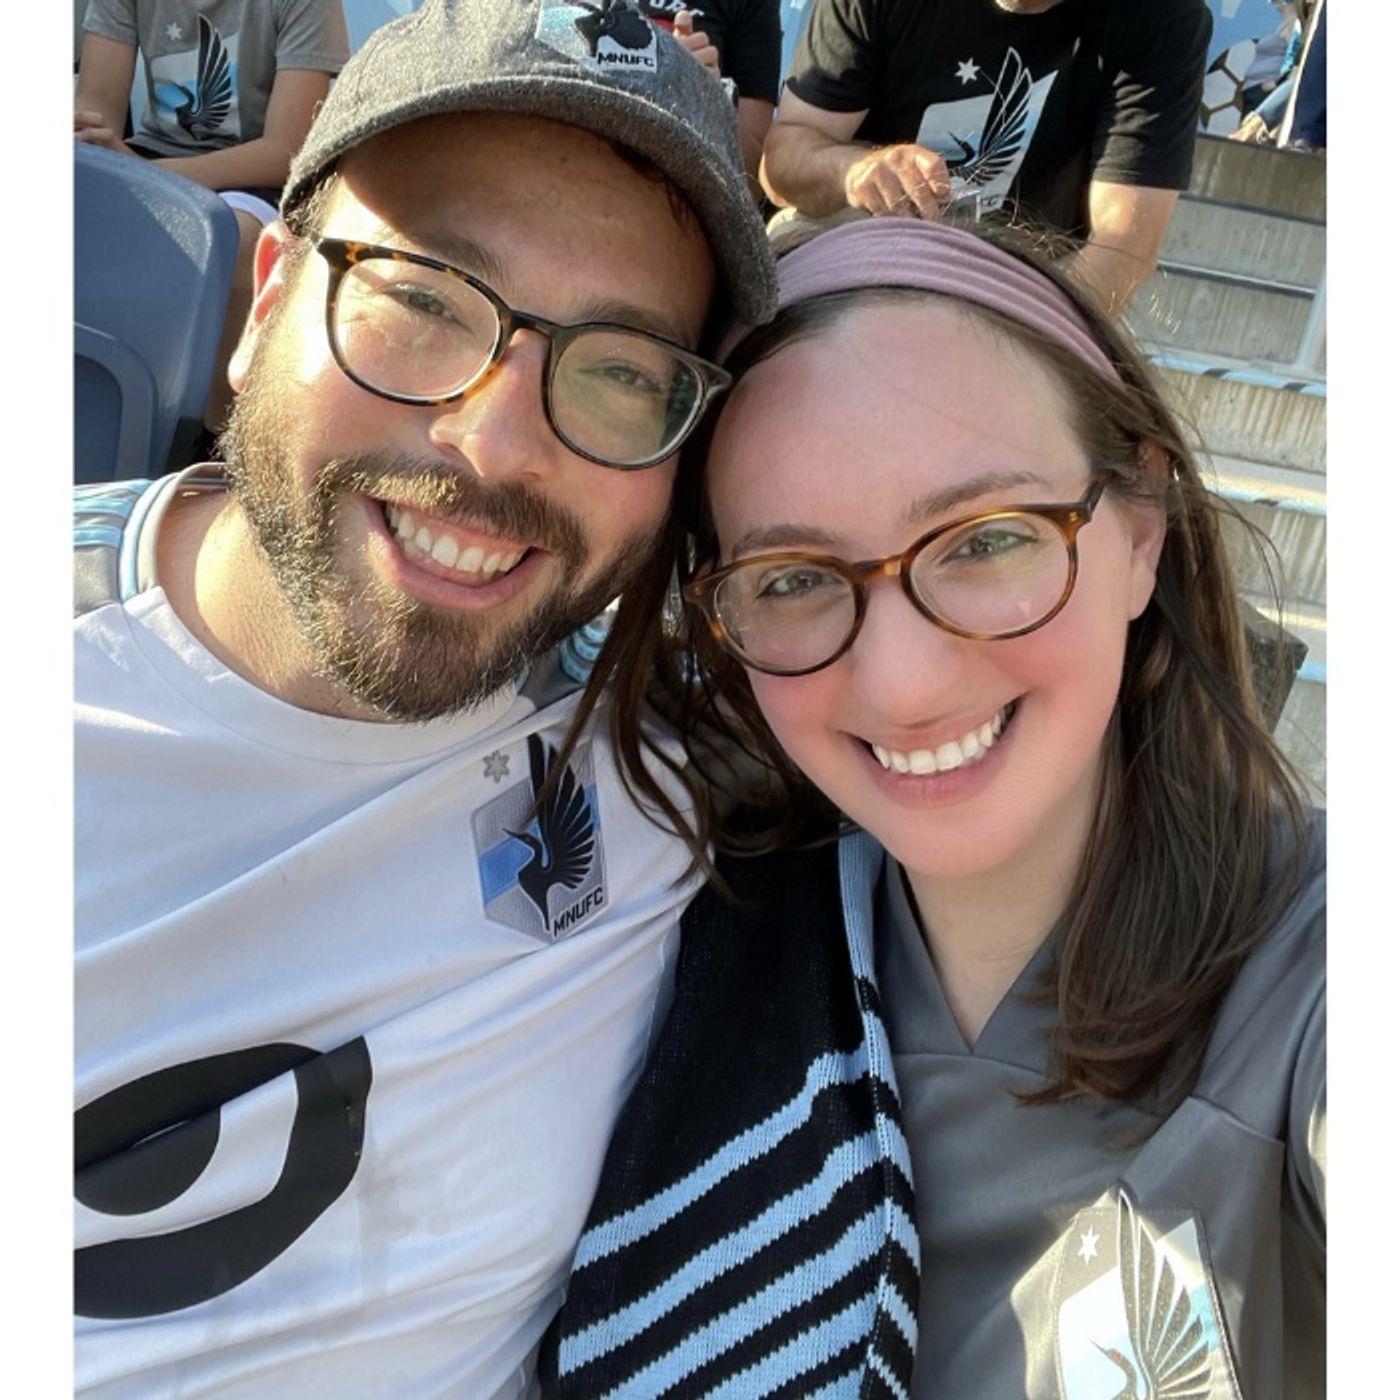 Rabbis Rachel and Marcus Rubenstein